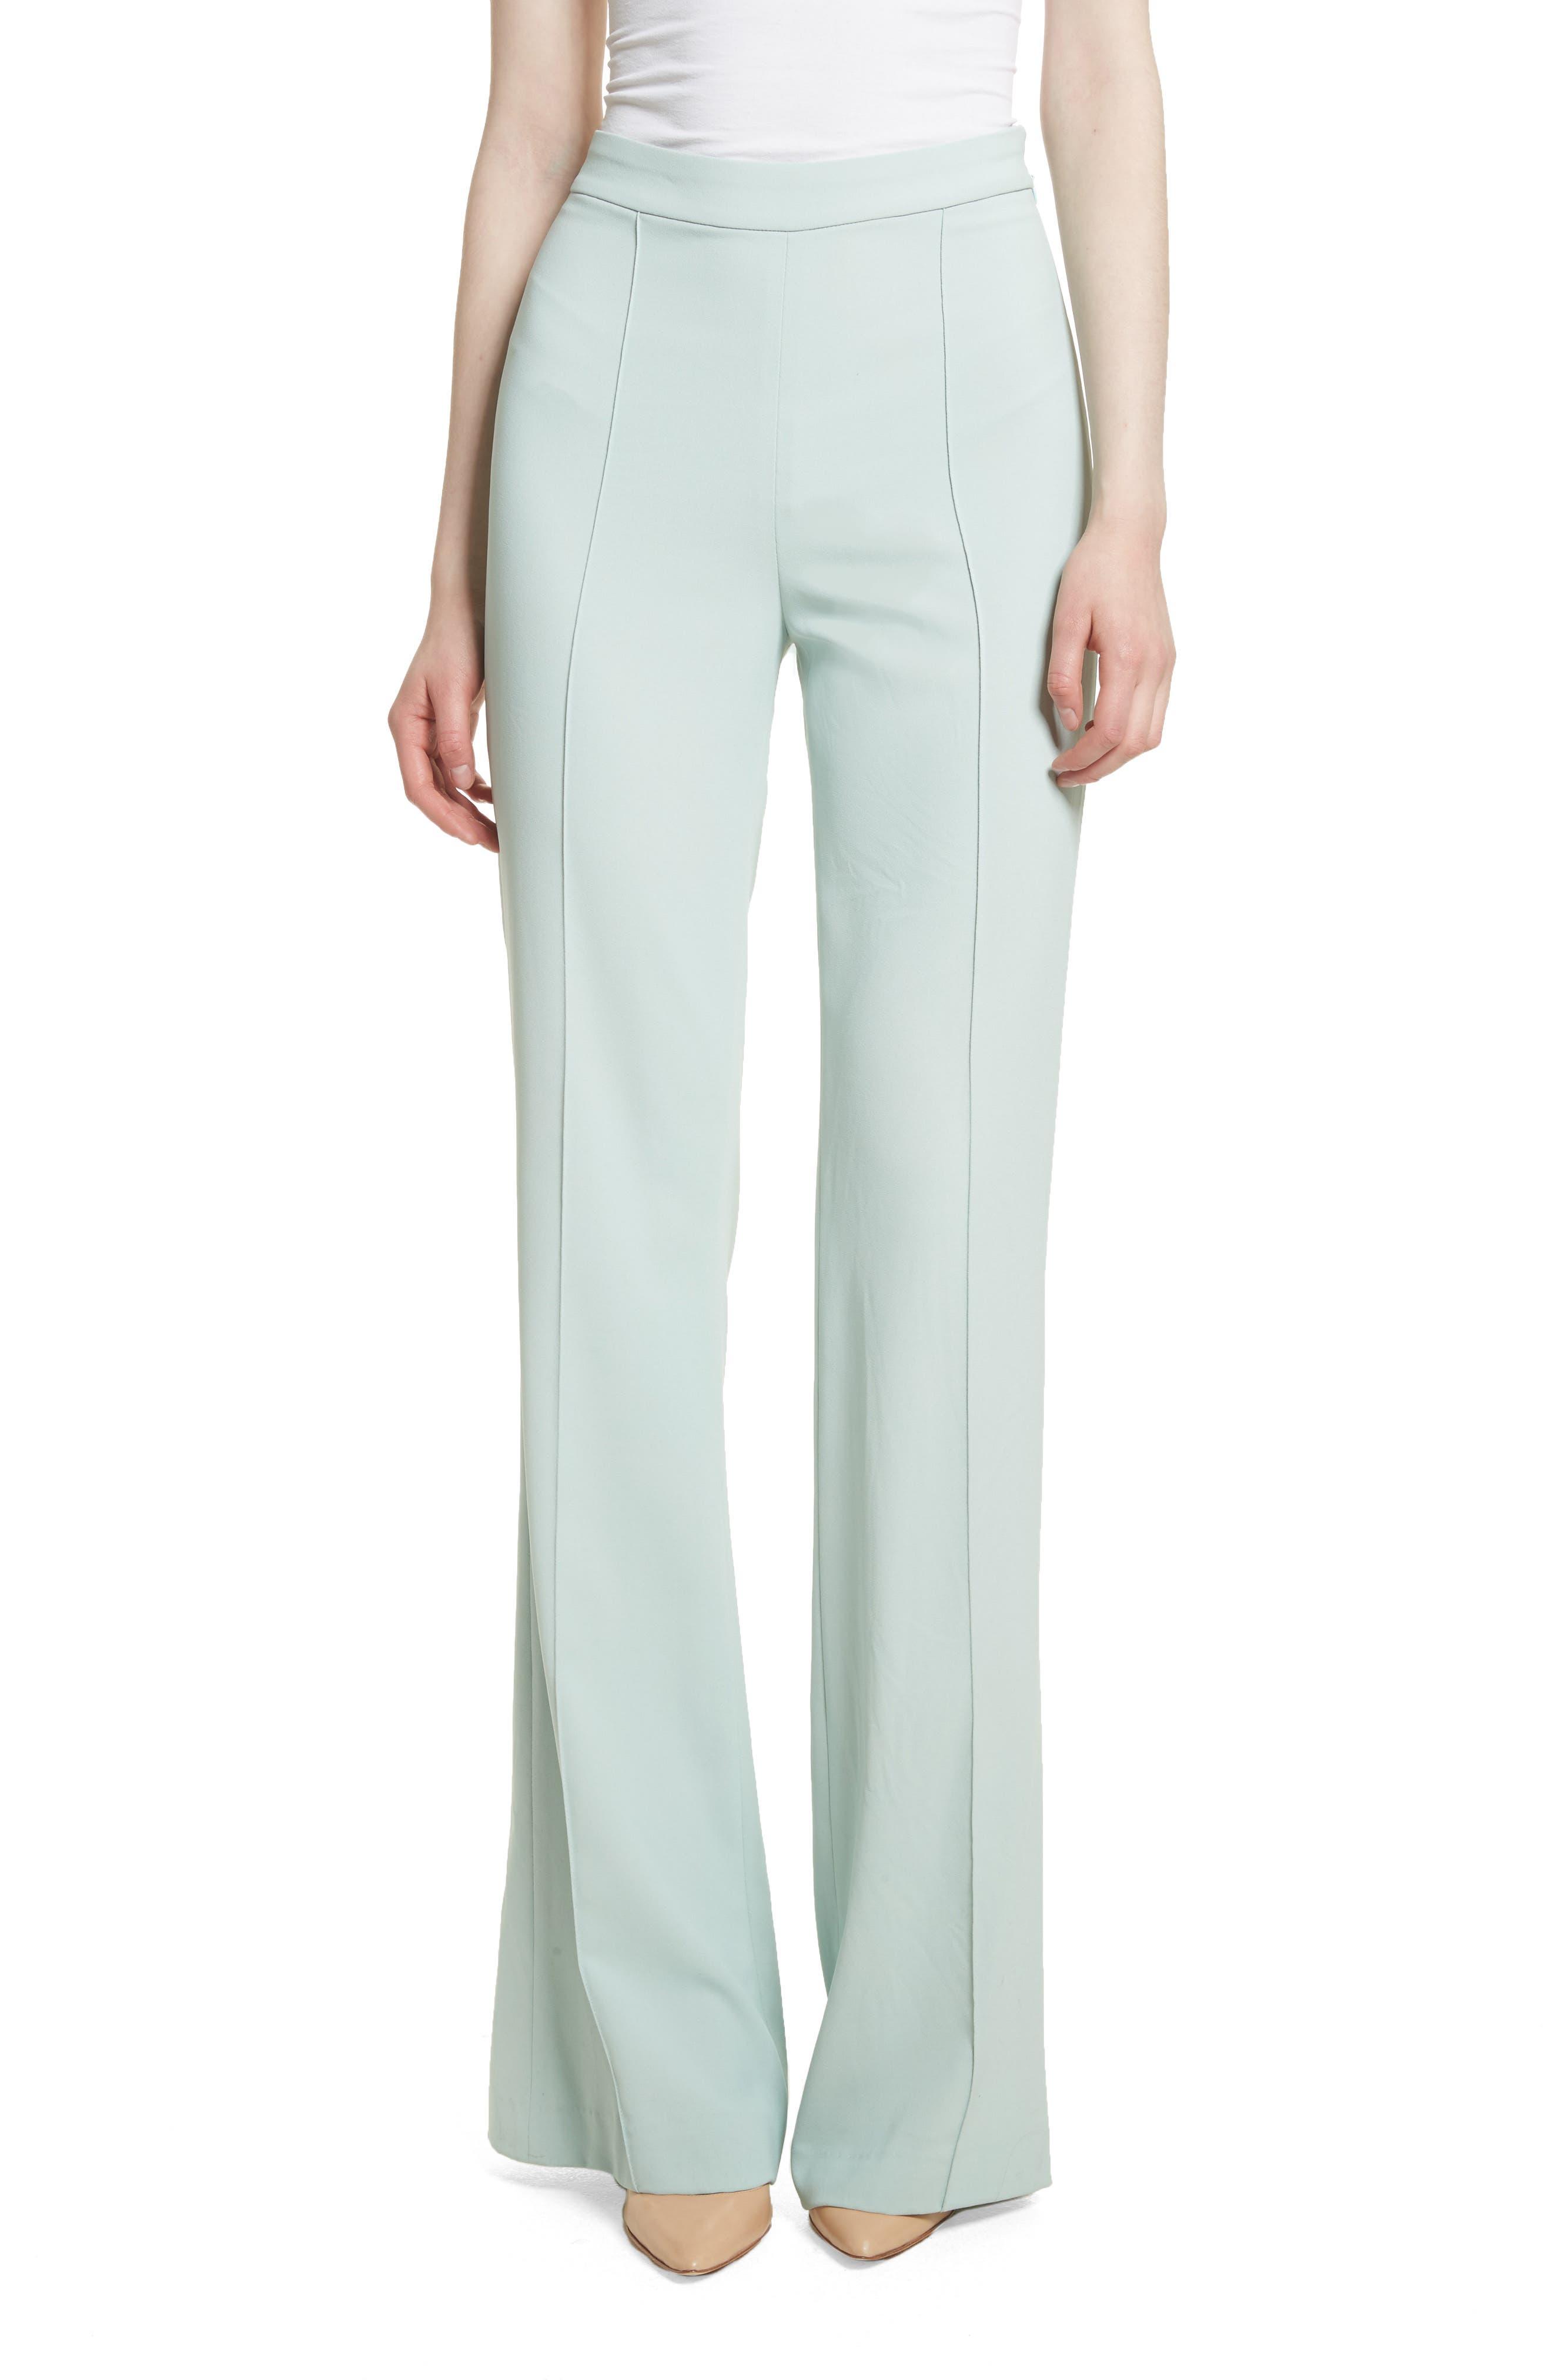 Jalisa High Waist Flared Leg Pants,                         Main,                         color, 404